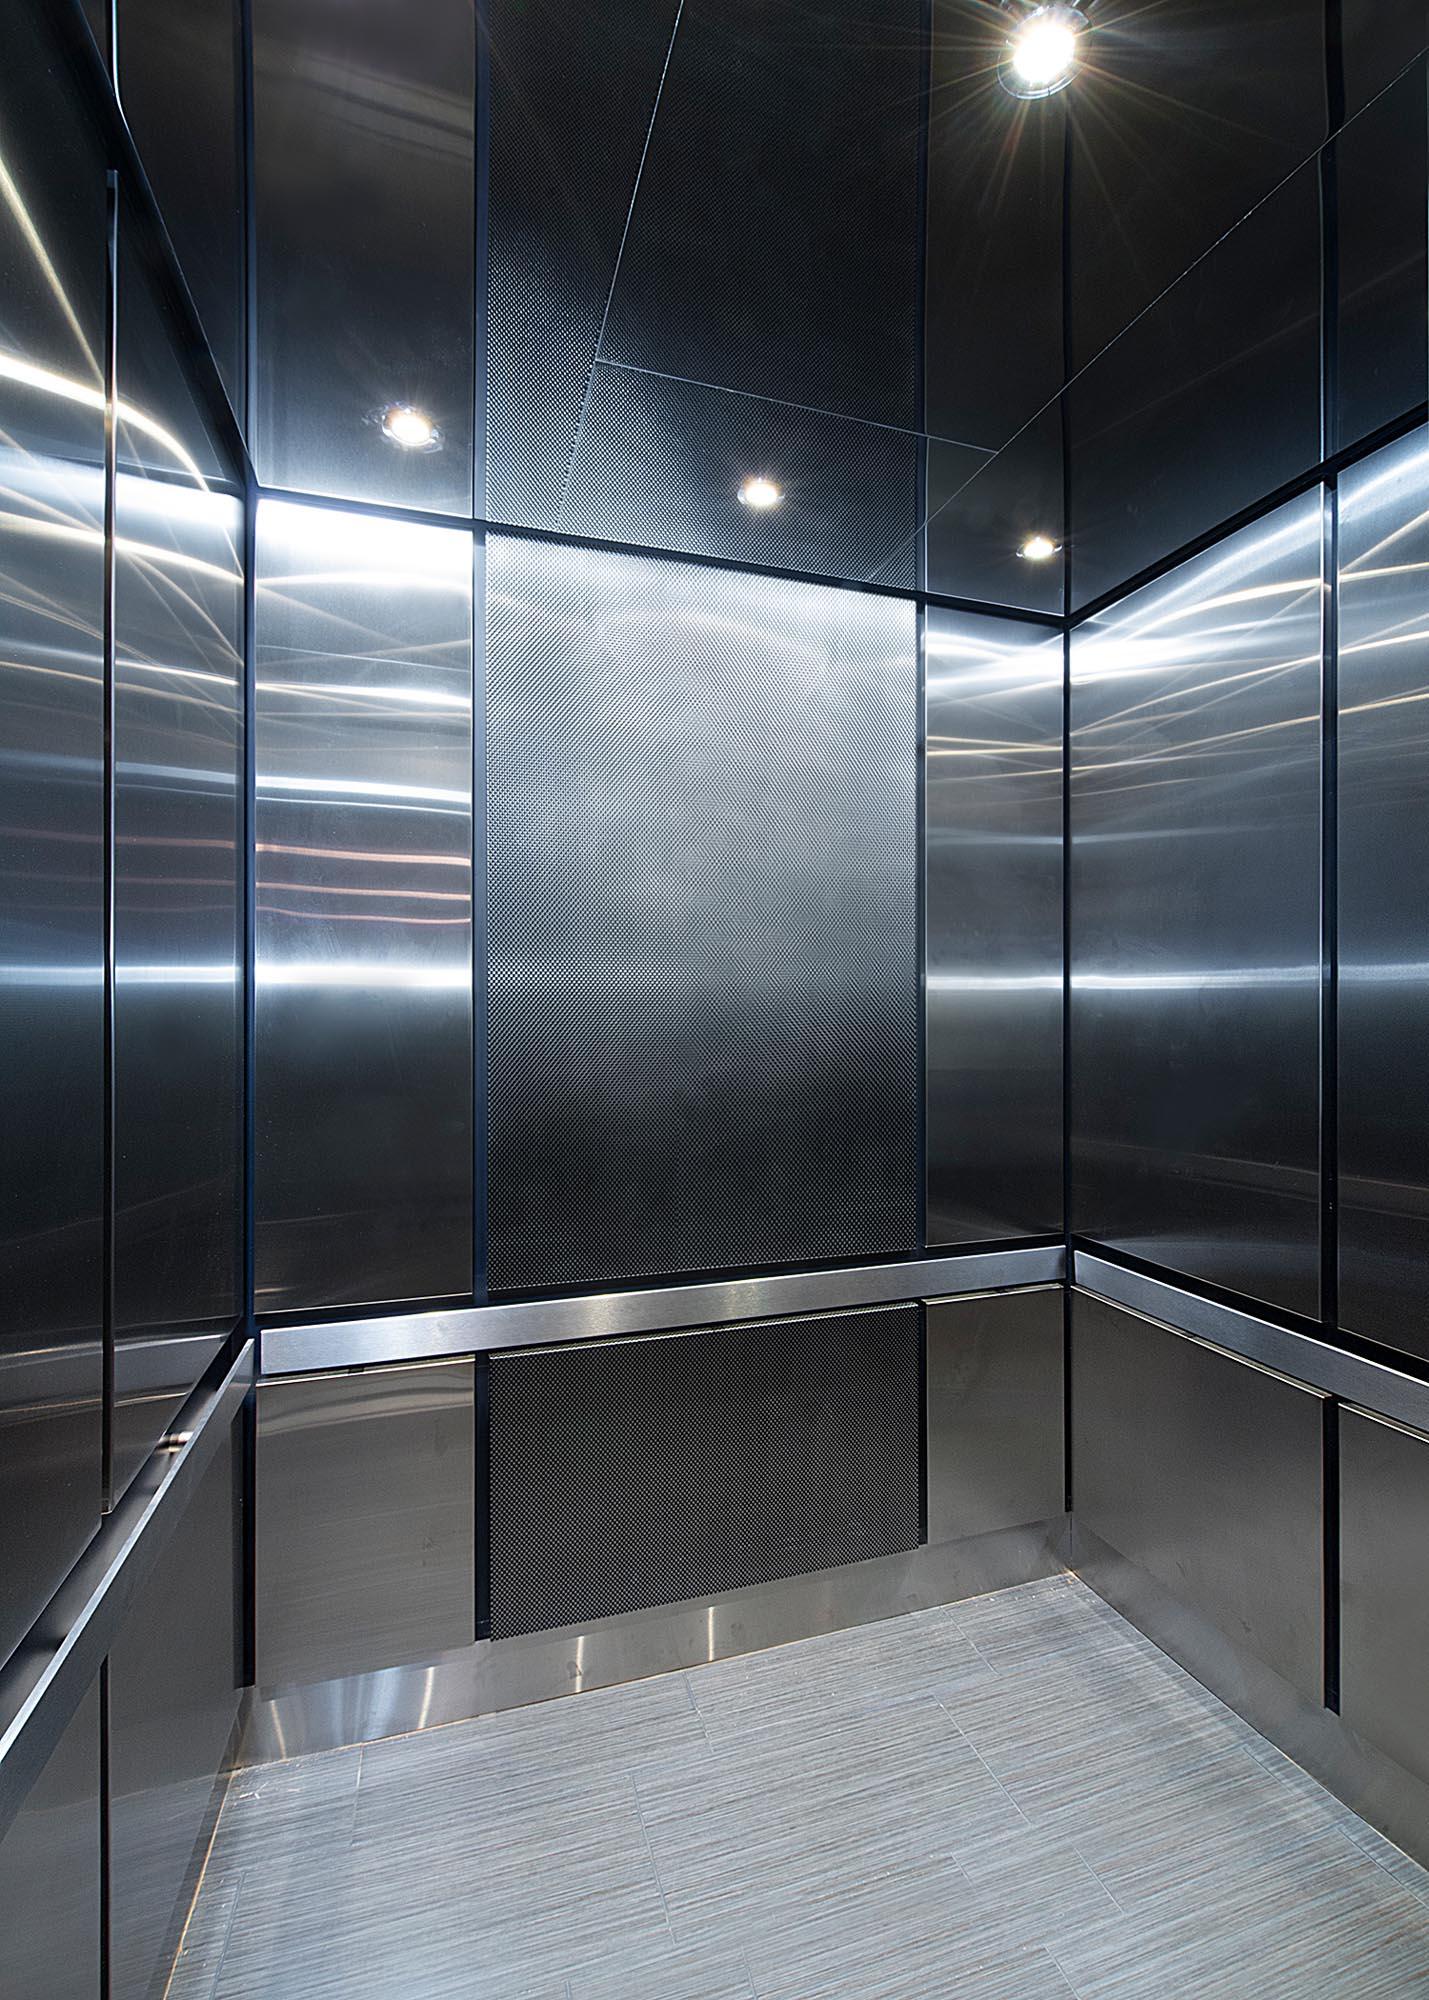 837 Art Ave Elevator